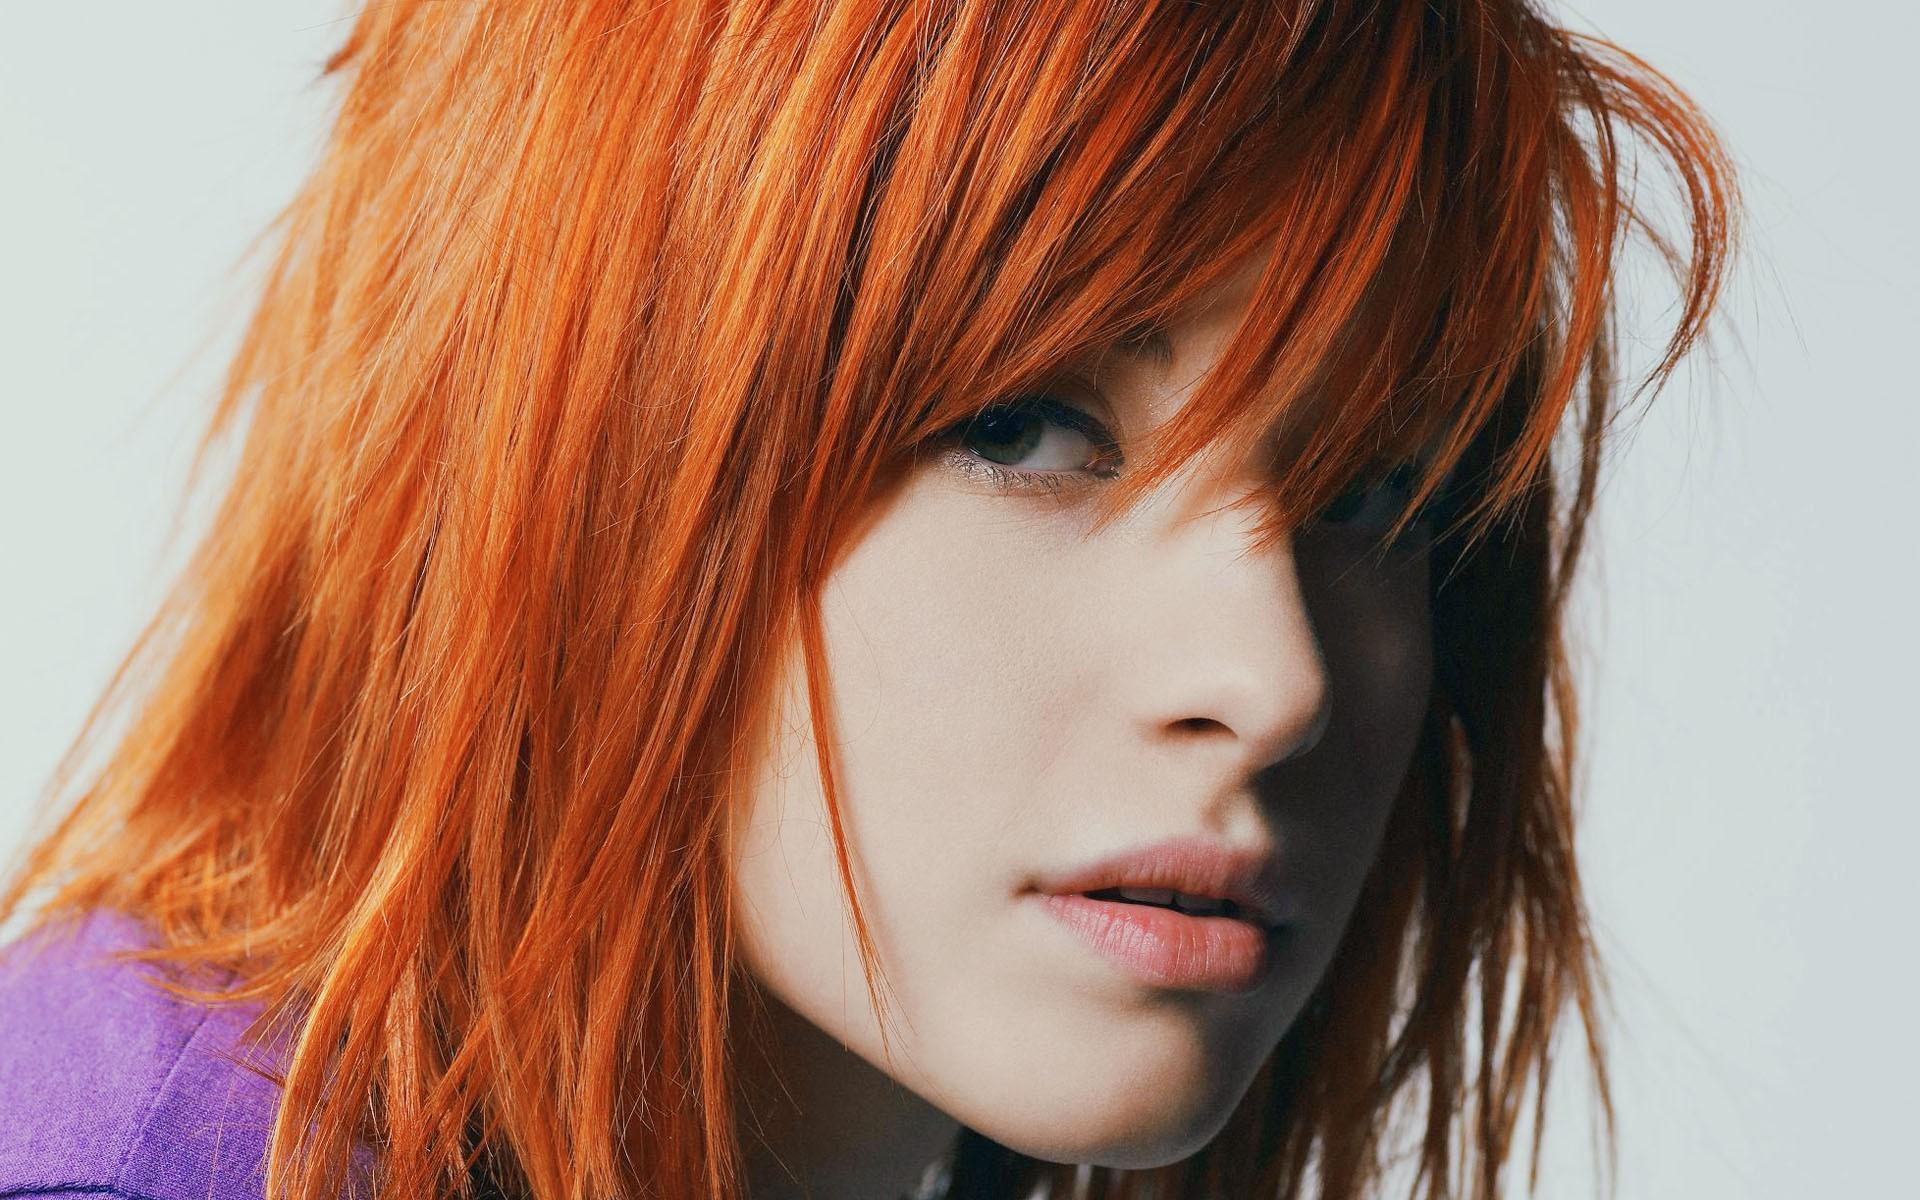 Hayley Williams